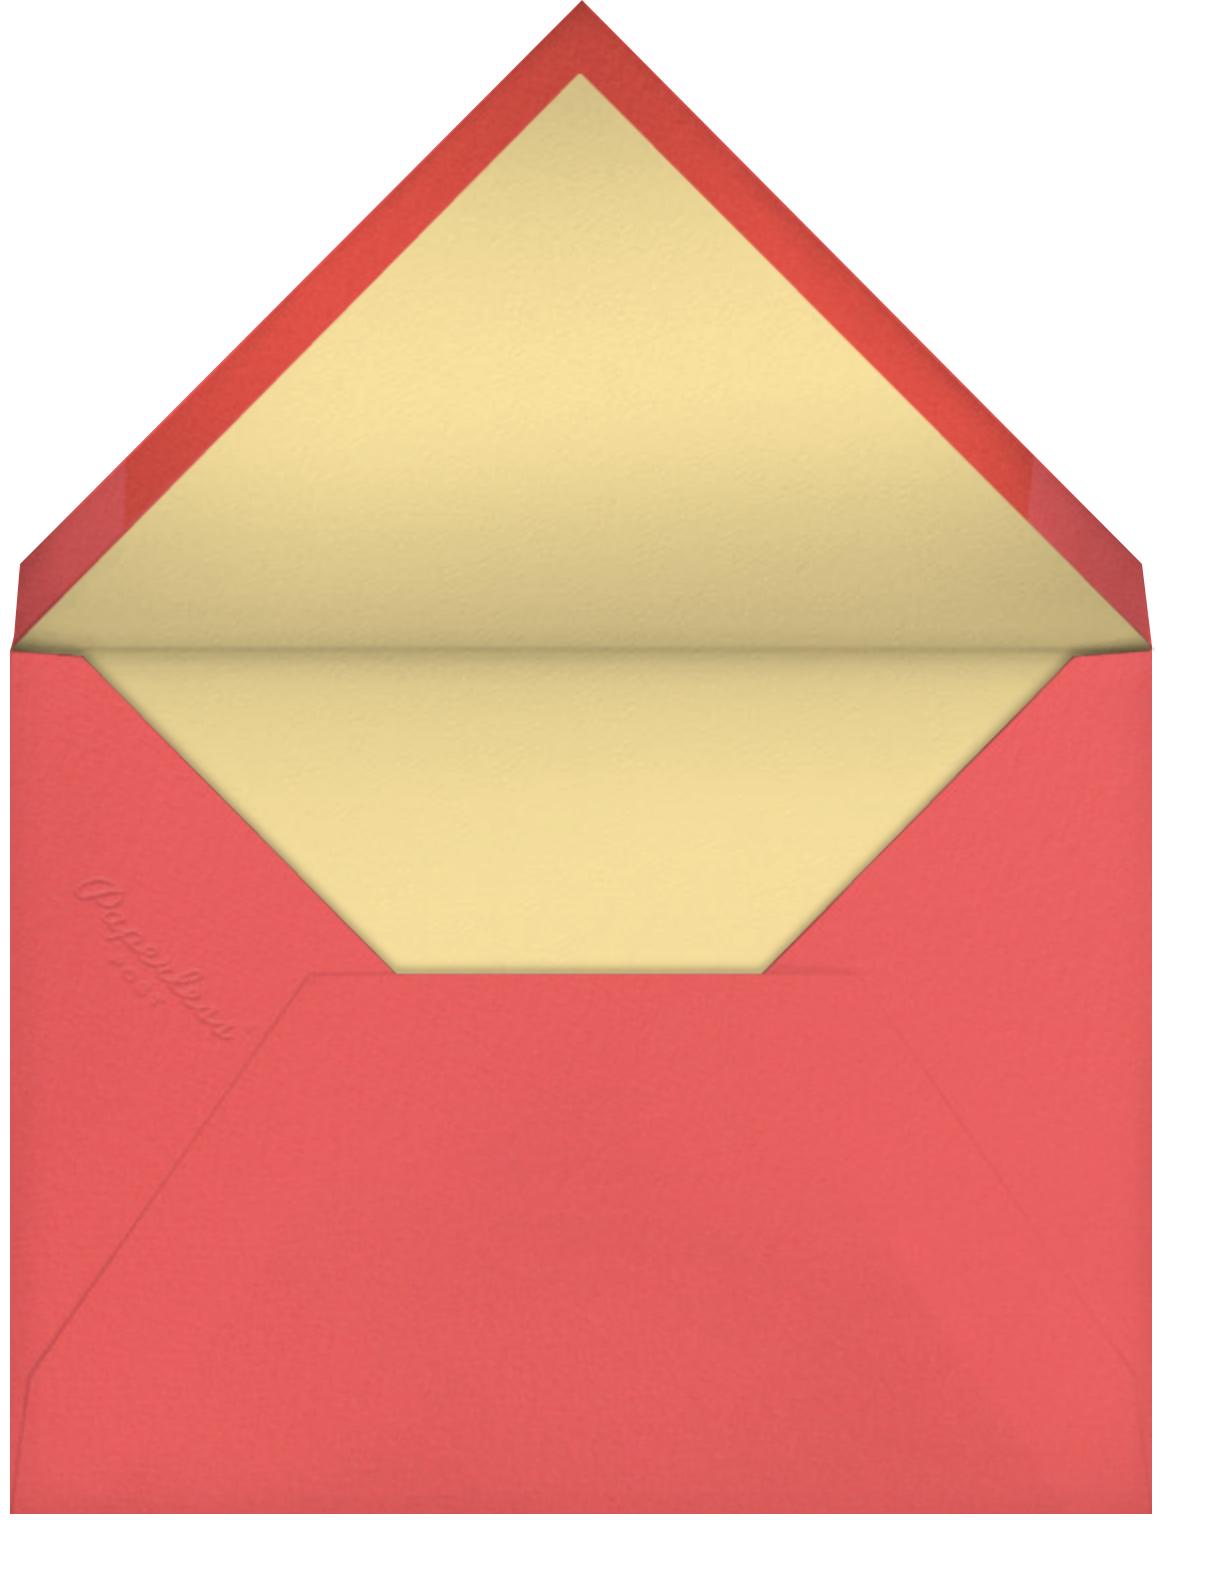 Birthday Bike (Blanca Gómez) - Tan - Red Cap Cards - Birthday - envelope back